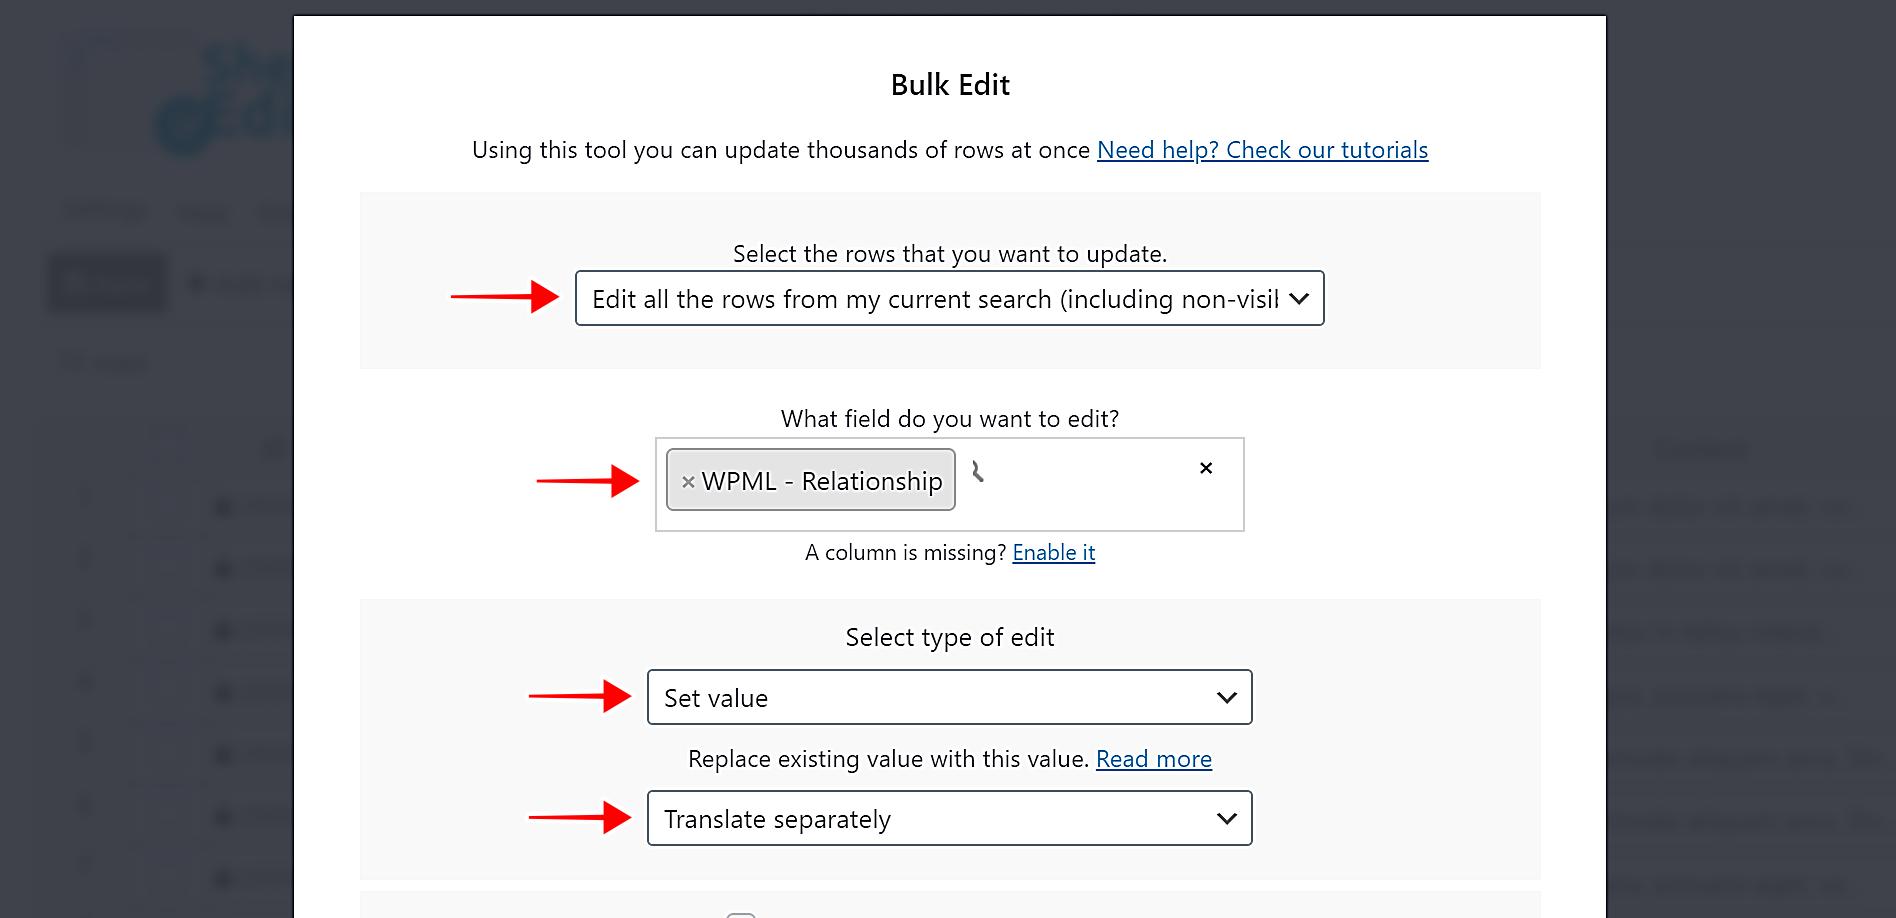 WPML –将所有翻译标记为重复或分开